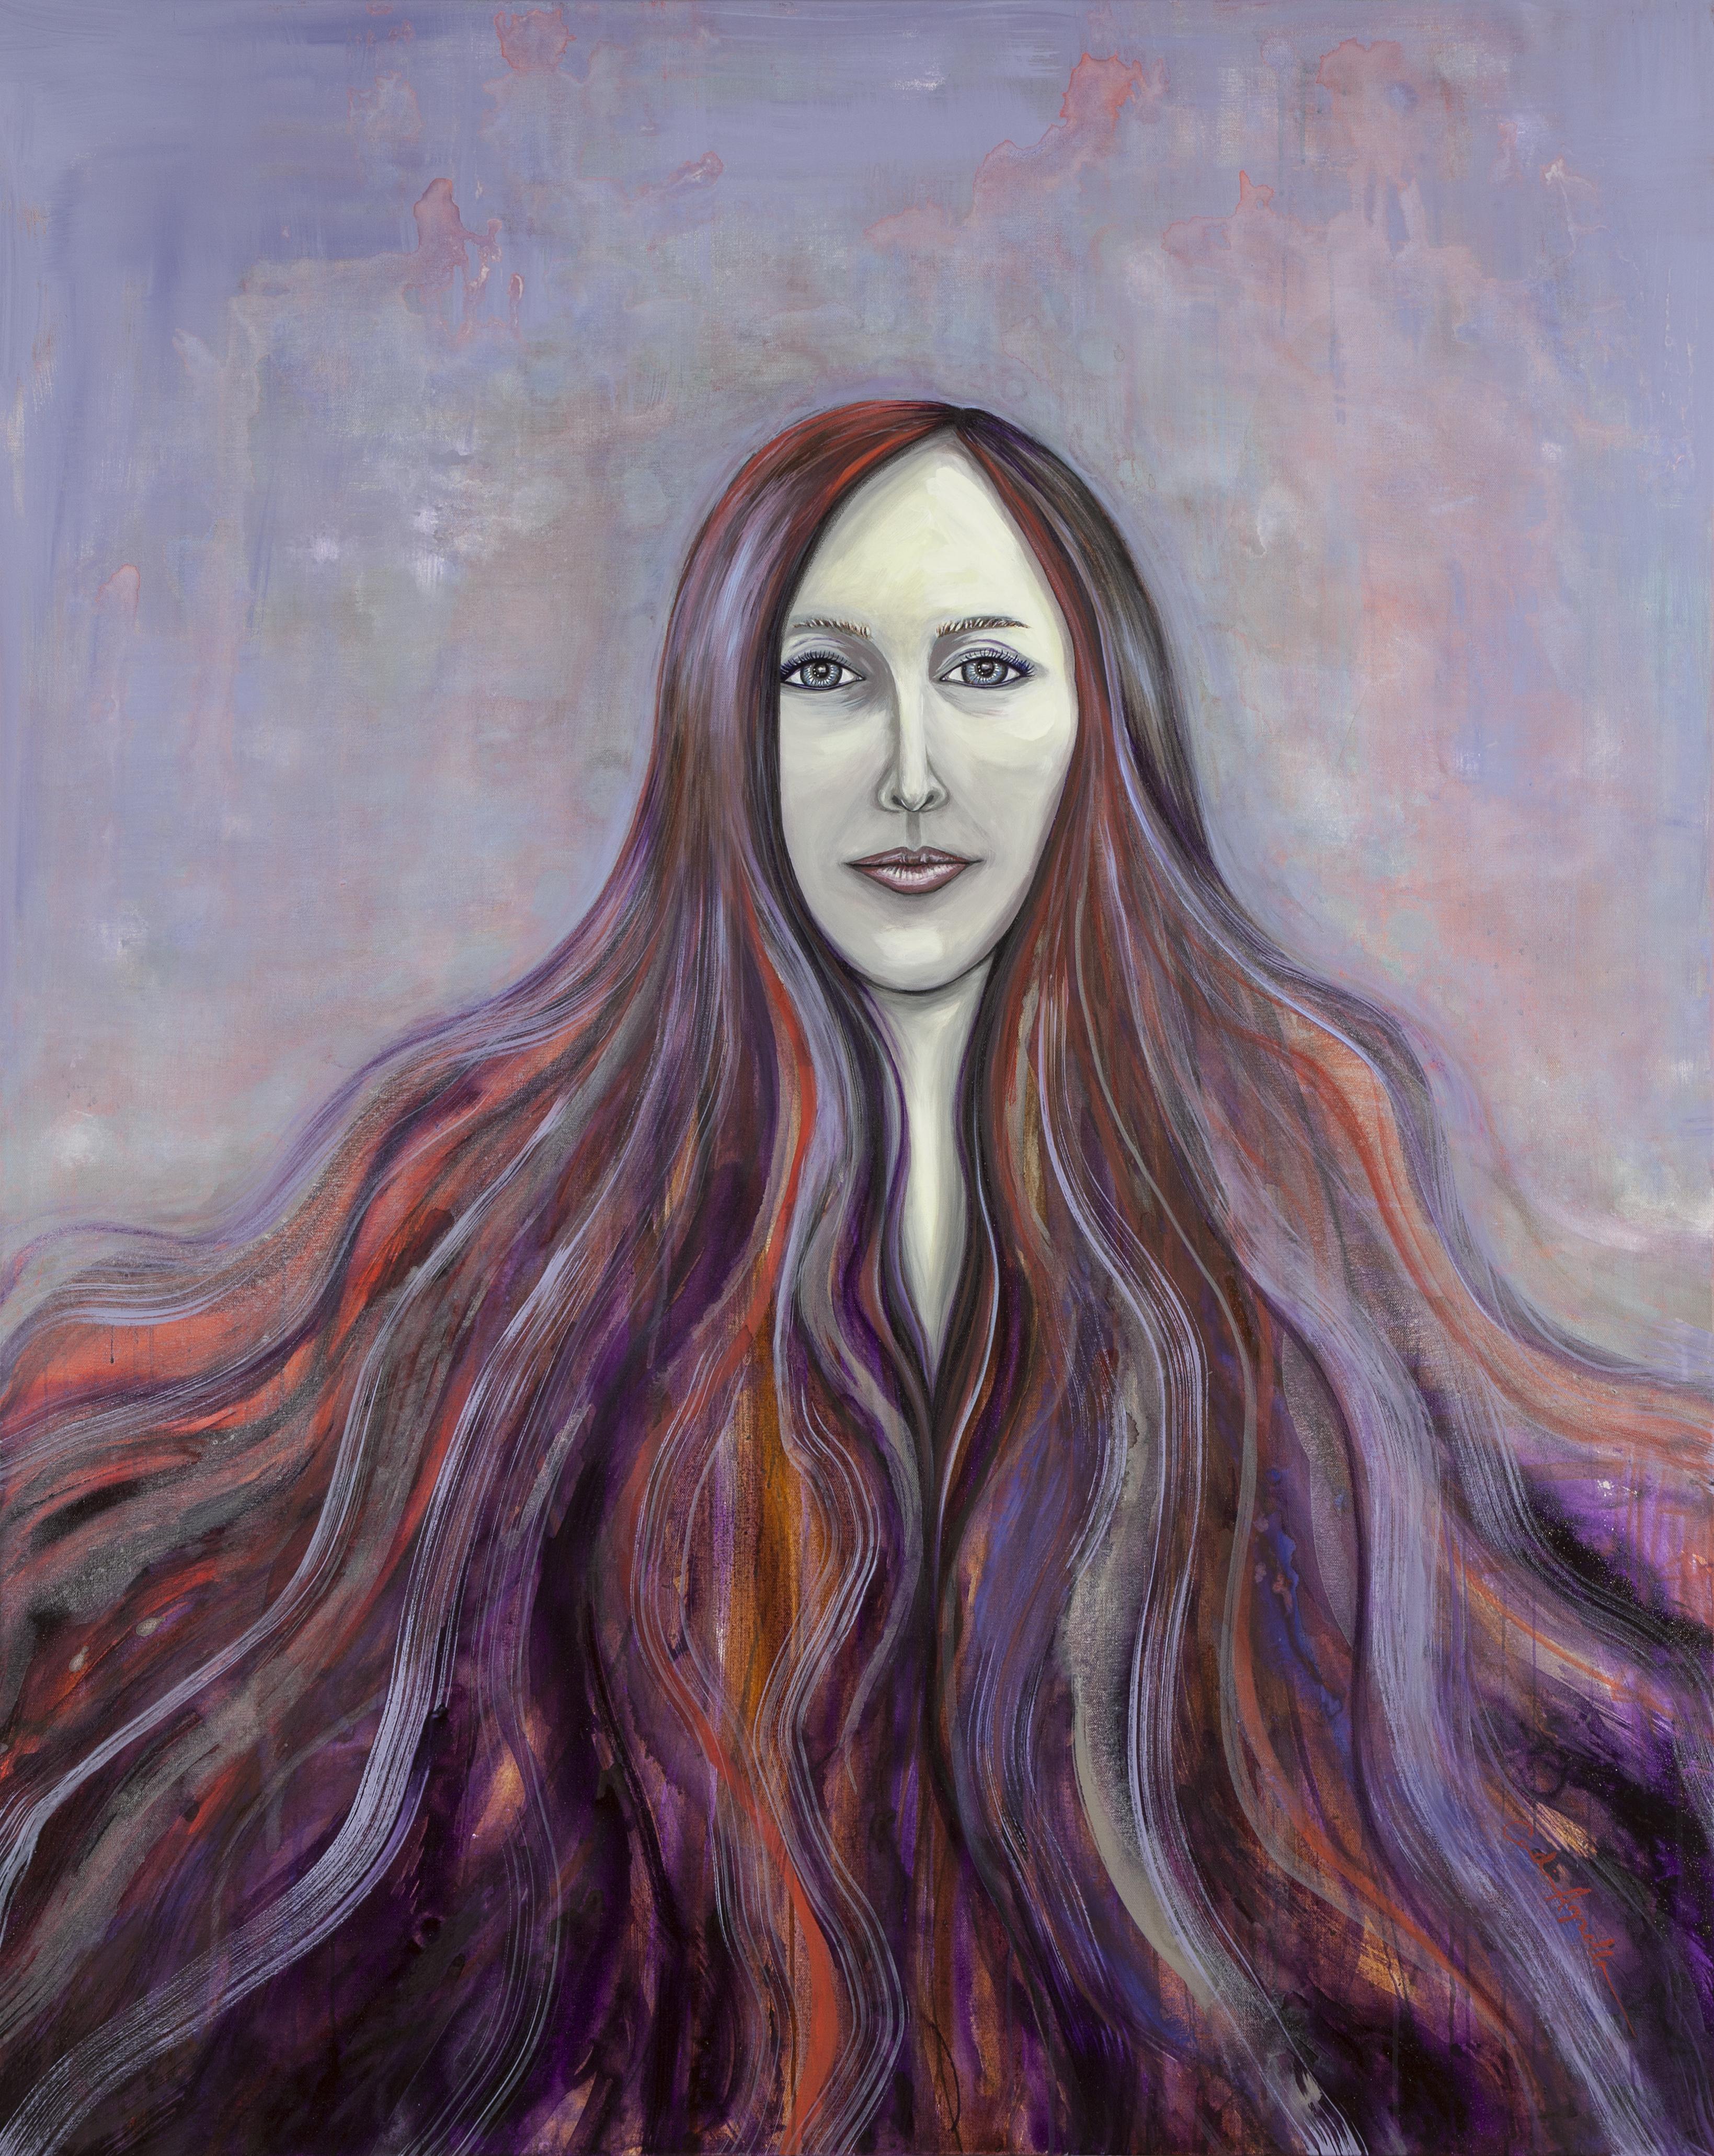 Kathryn - Goddess of C'vile